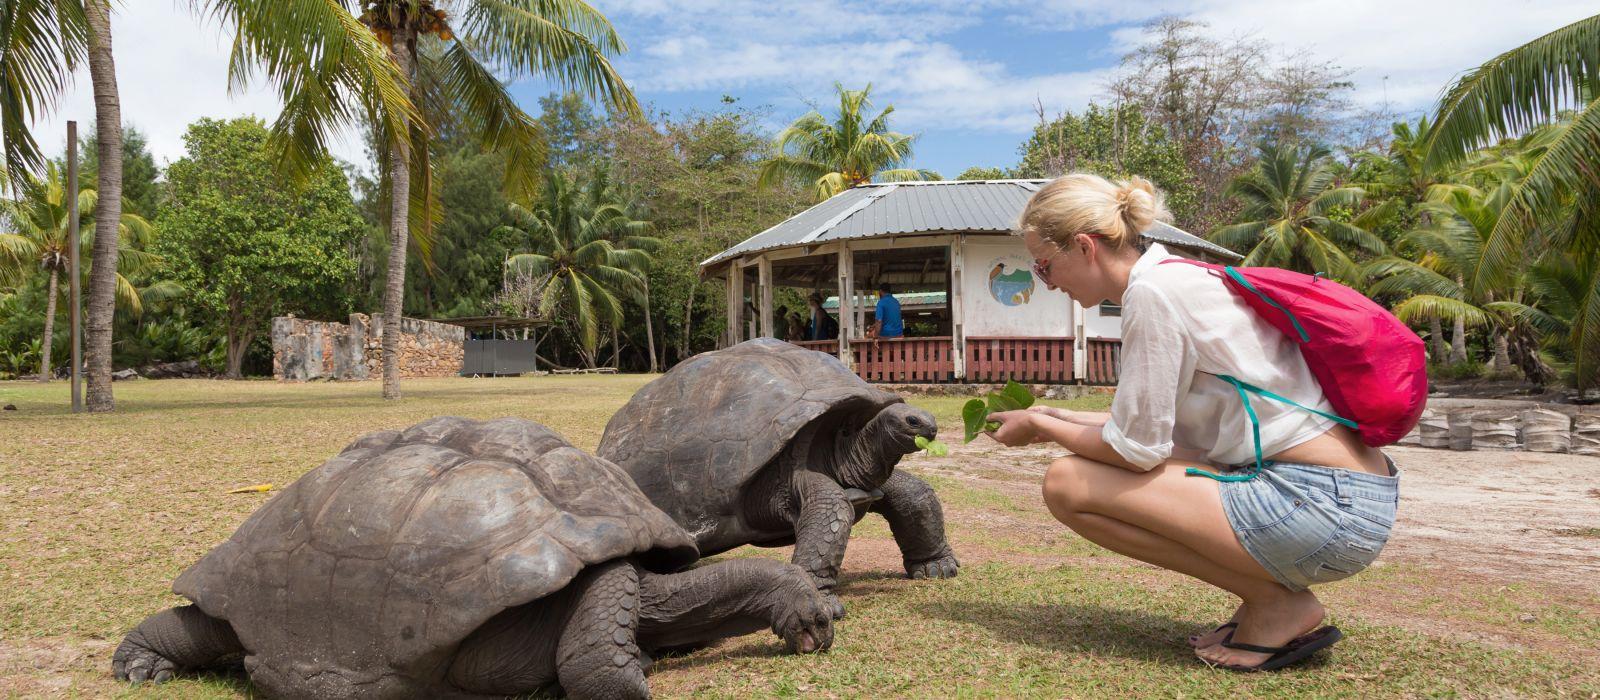 Seychelles safety - Female tourist woman feeding old Aldabra giant tortoises in National Marine Park on Curieuse island, Praslin, Seychelles, Africa